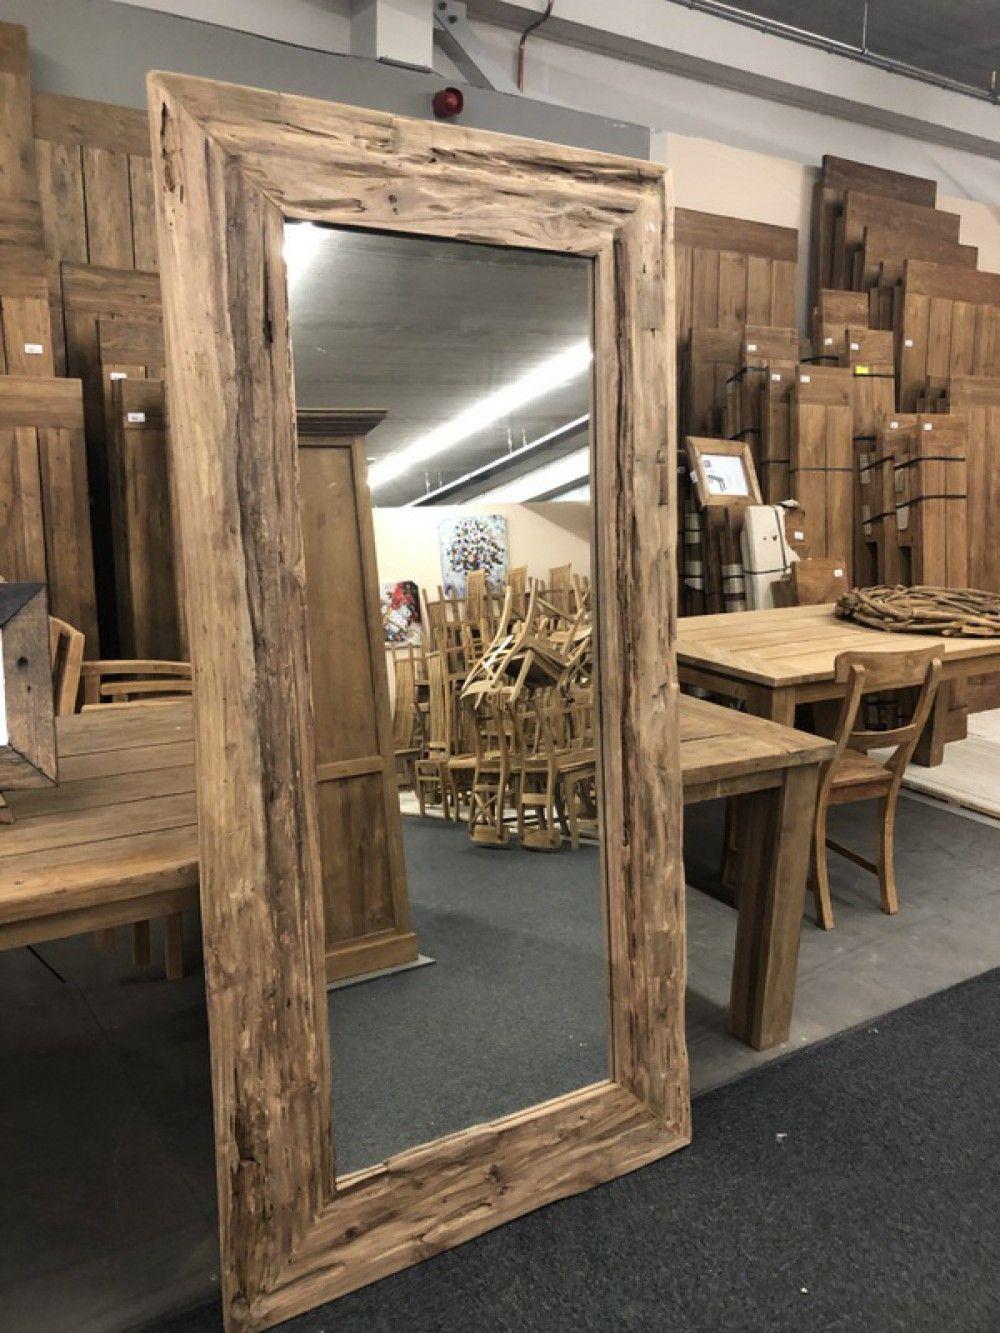 Spiegel Massivholz Teak Wandspiegel Masse 200 X 100 Cm